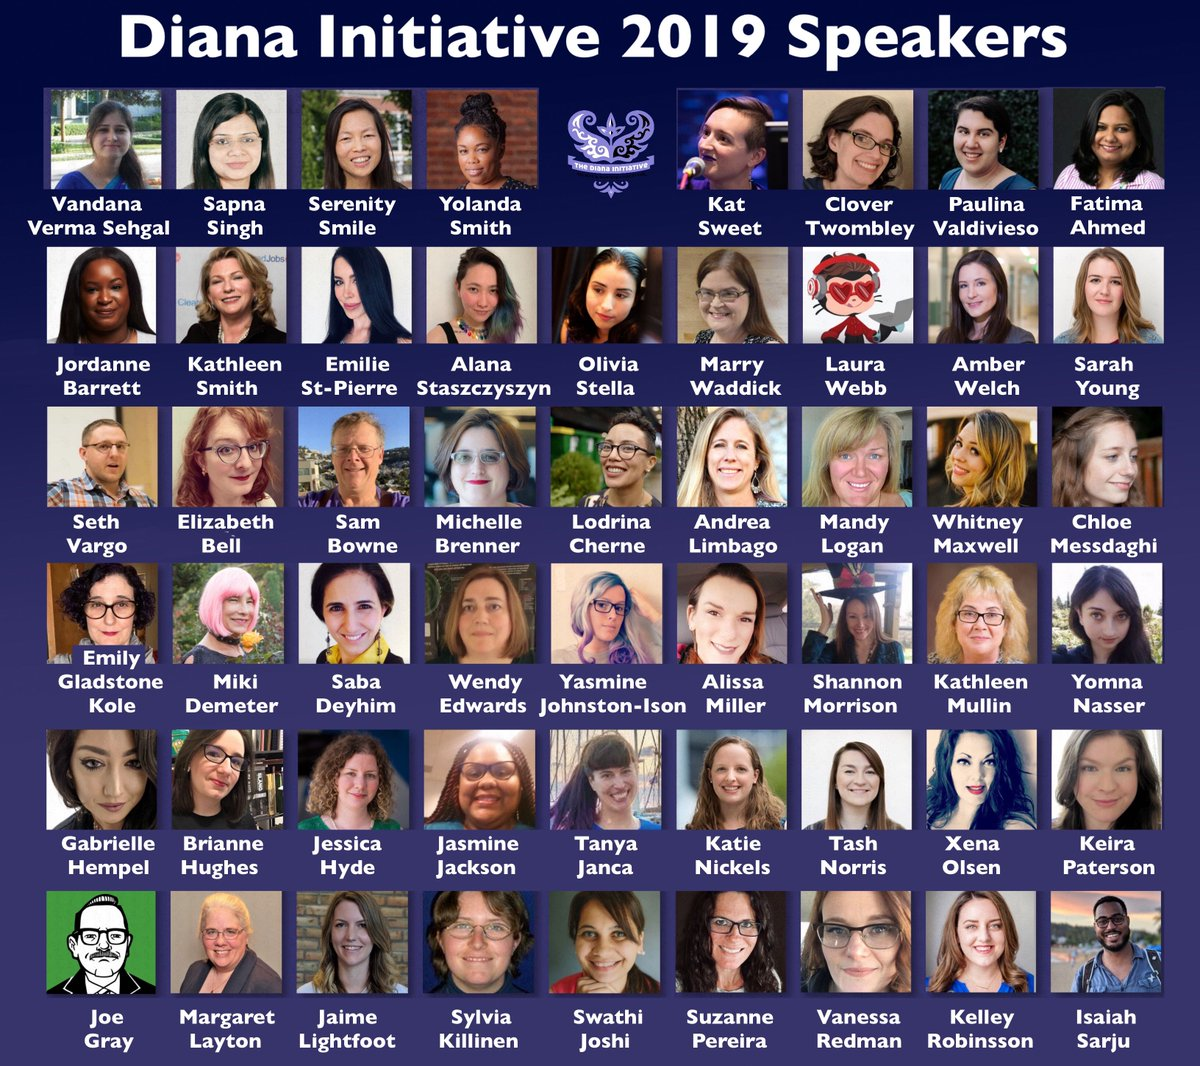 dianaspeakers2019